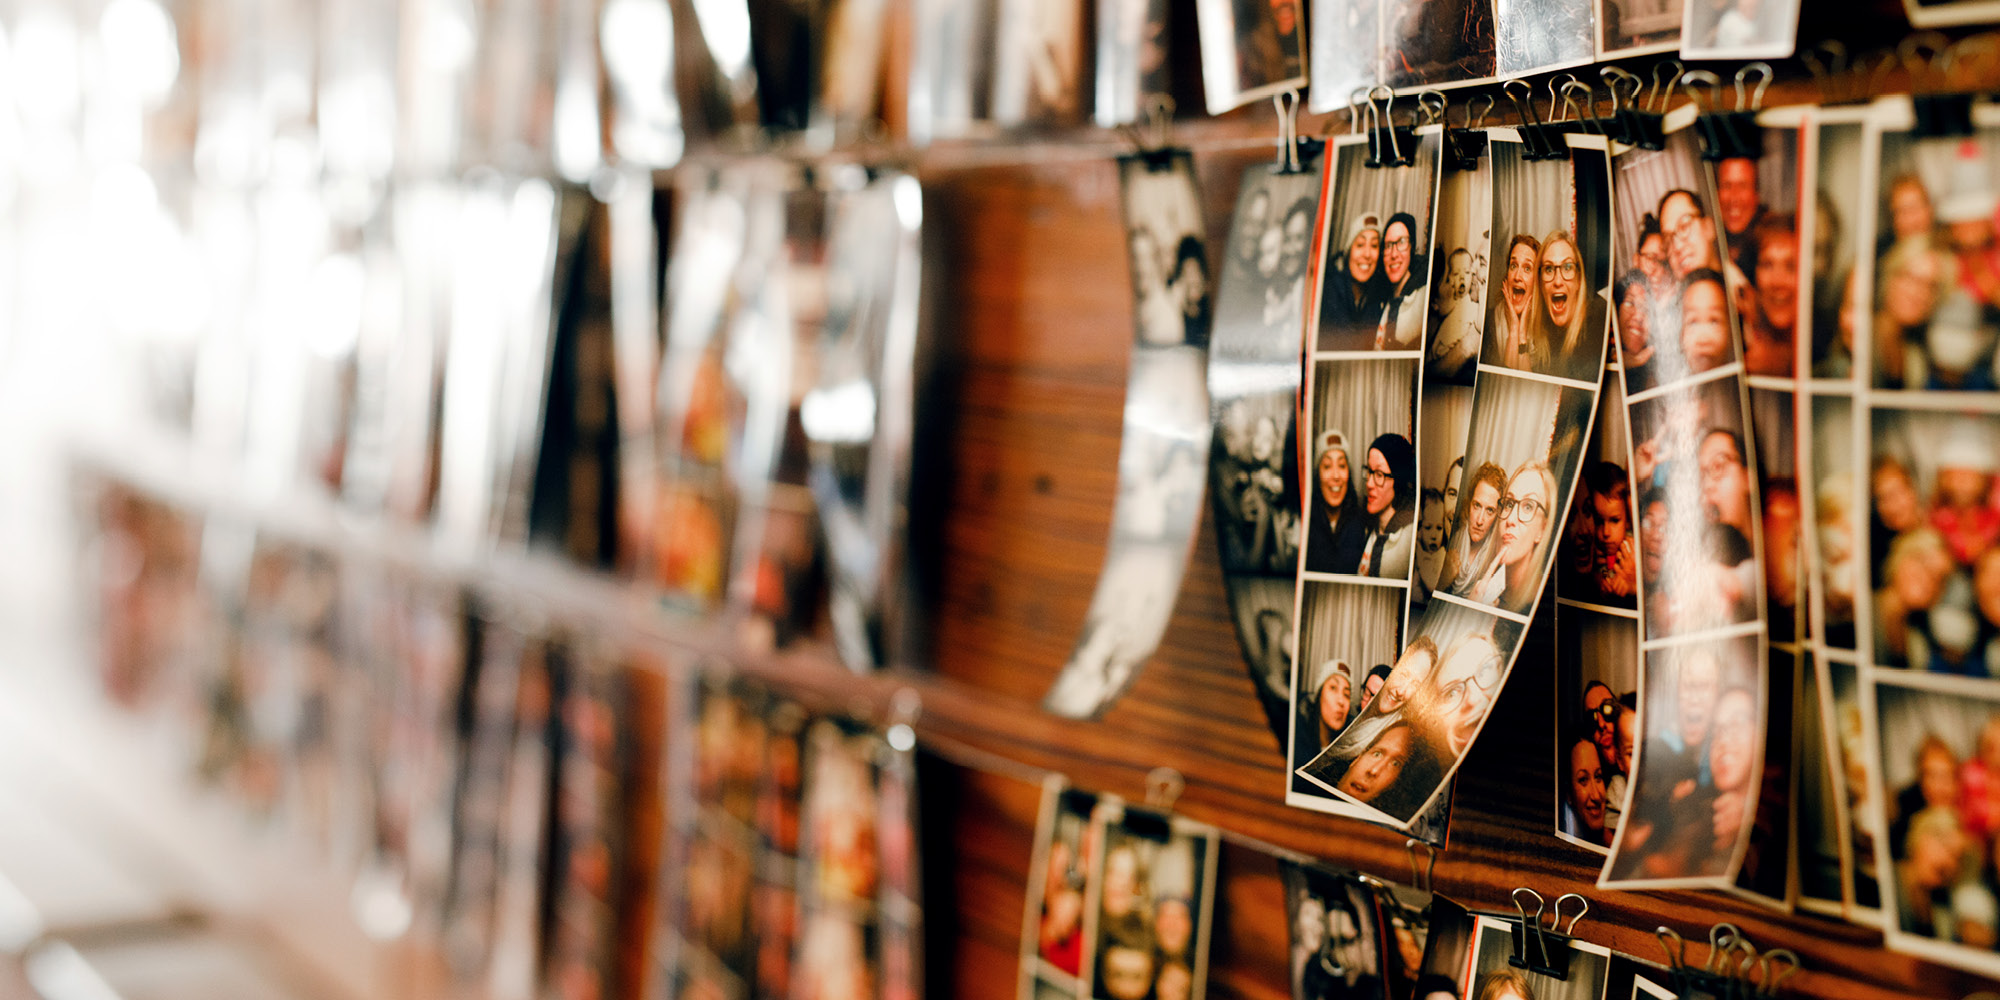 Gallery of polaroid photos.